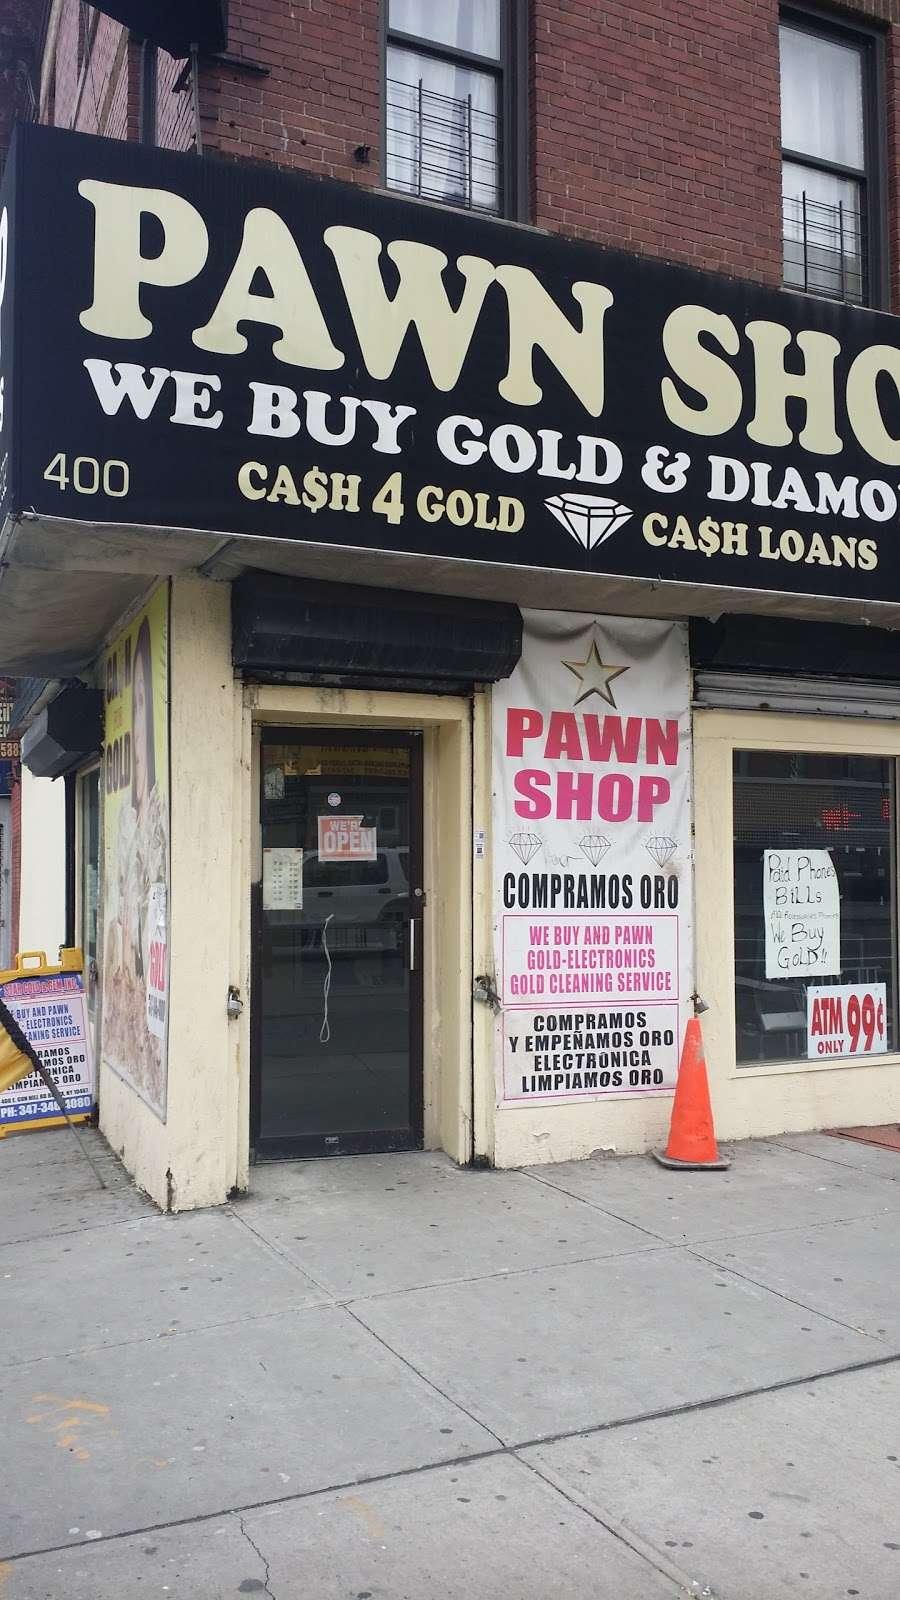 STAR GOLD & GEM - store  | Photo 3 of 10 | Address: 400 E Gun Hill Rd, Bronx, NY 10467, USA | Phone: (347) 346-4080